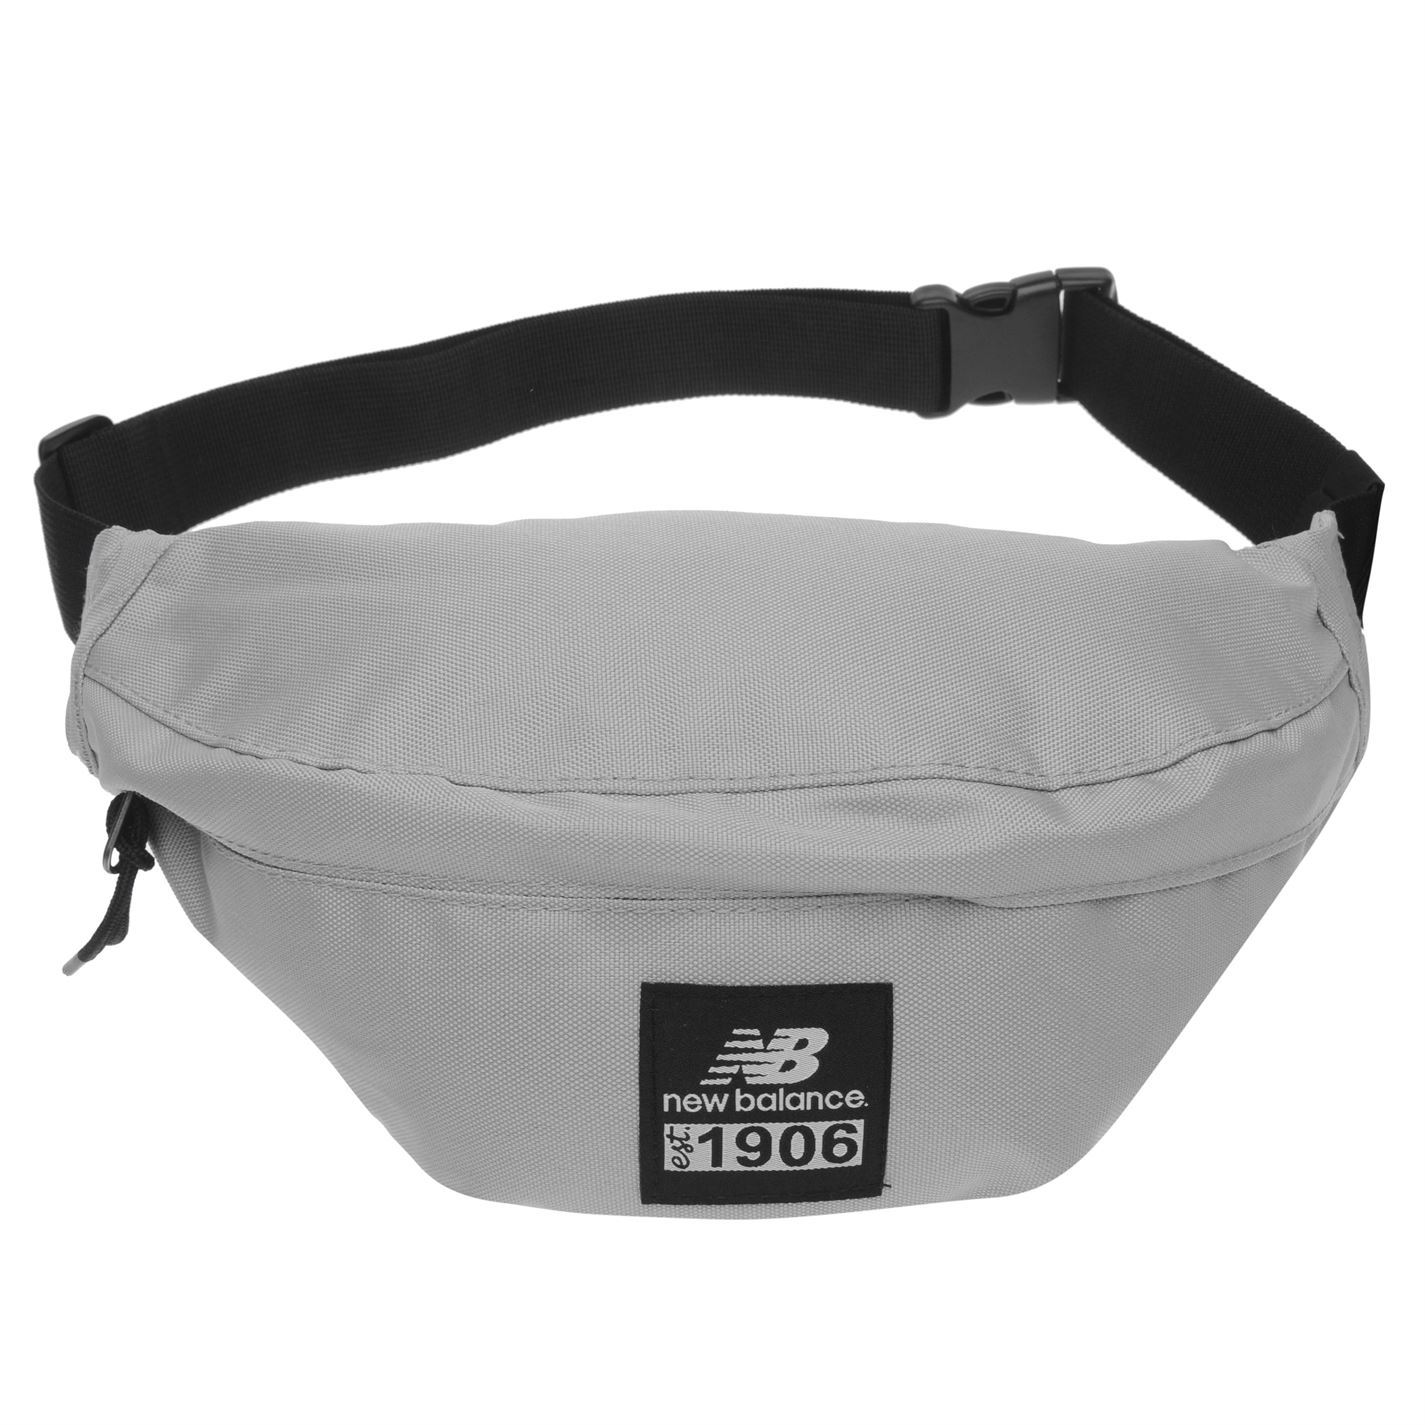 fdebfe916c ... New Balance Bum Bag Silver Small Items Waist Band Fanny Pack ...